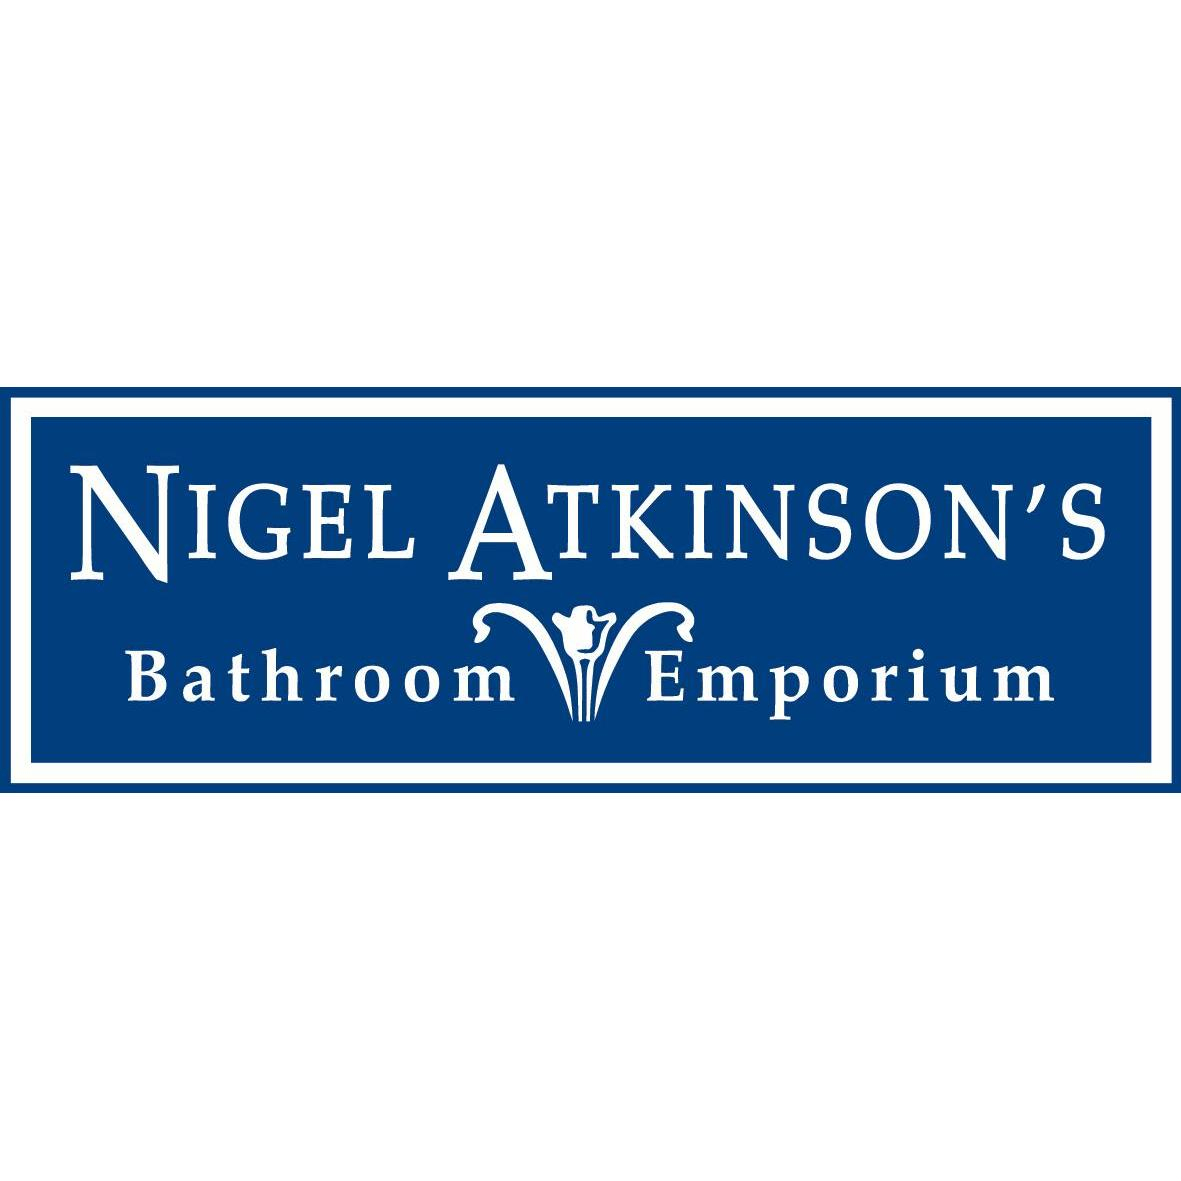 Nigel Atkinson's Bathroom Emporium Ltd - Thirsk, North Yorkshire YO7 1DA - 01845 574555 | ShowMeLocal.com